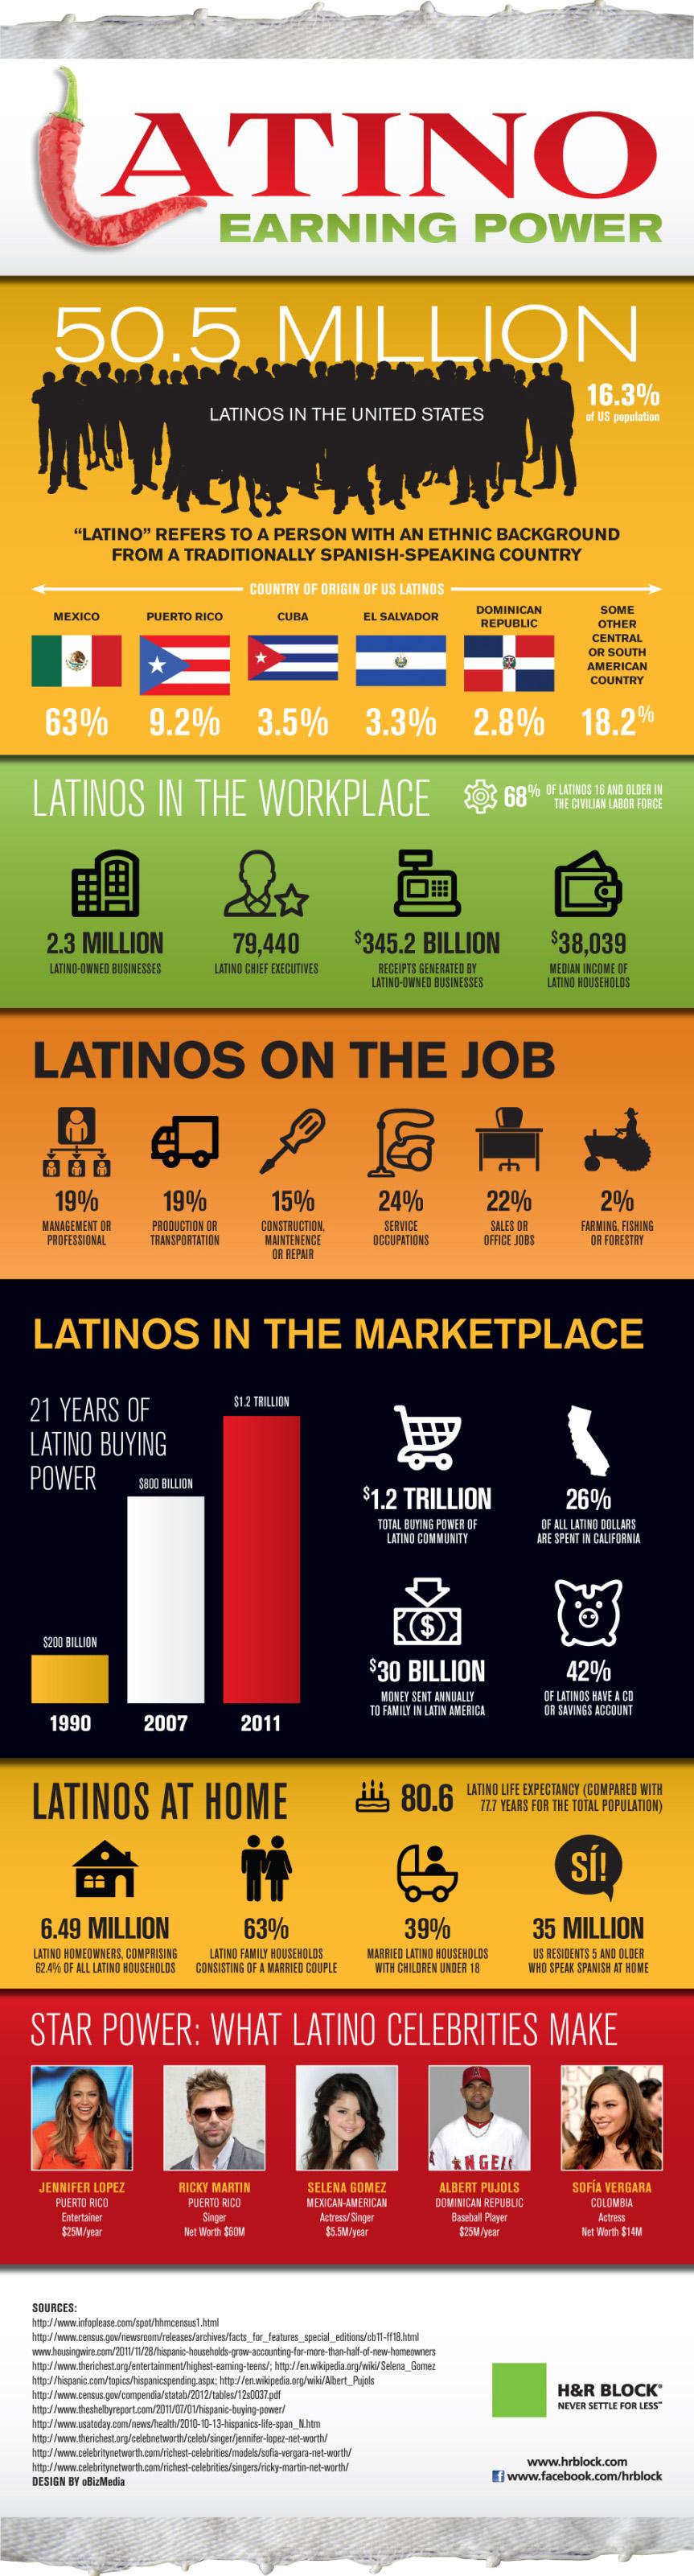 Latino Earning Power